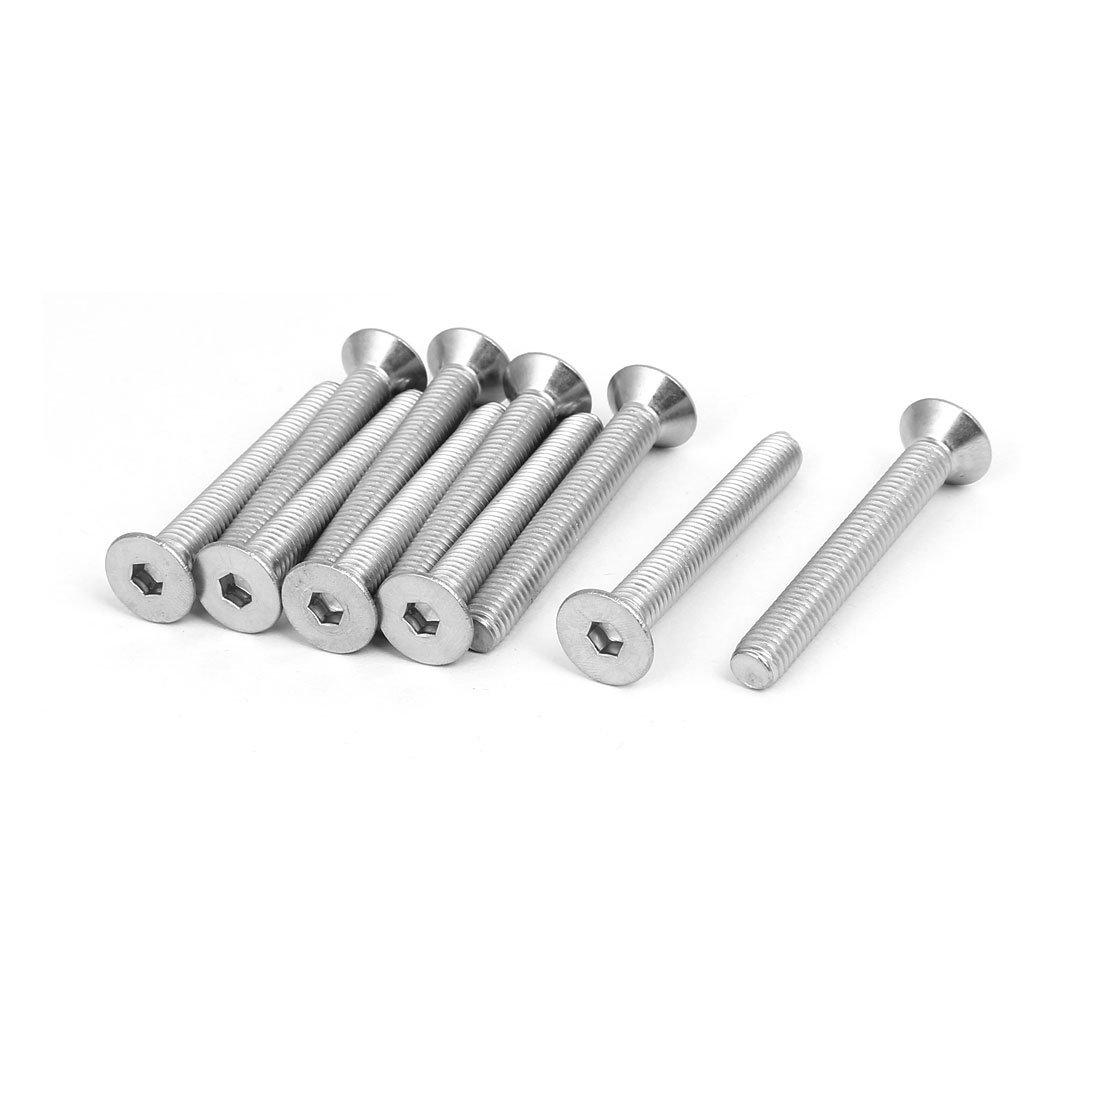 uxcell M8x60mm 304 Stainless Steel Flat Head Hex Socket Cap Screws DIN7991 10pcs